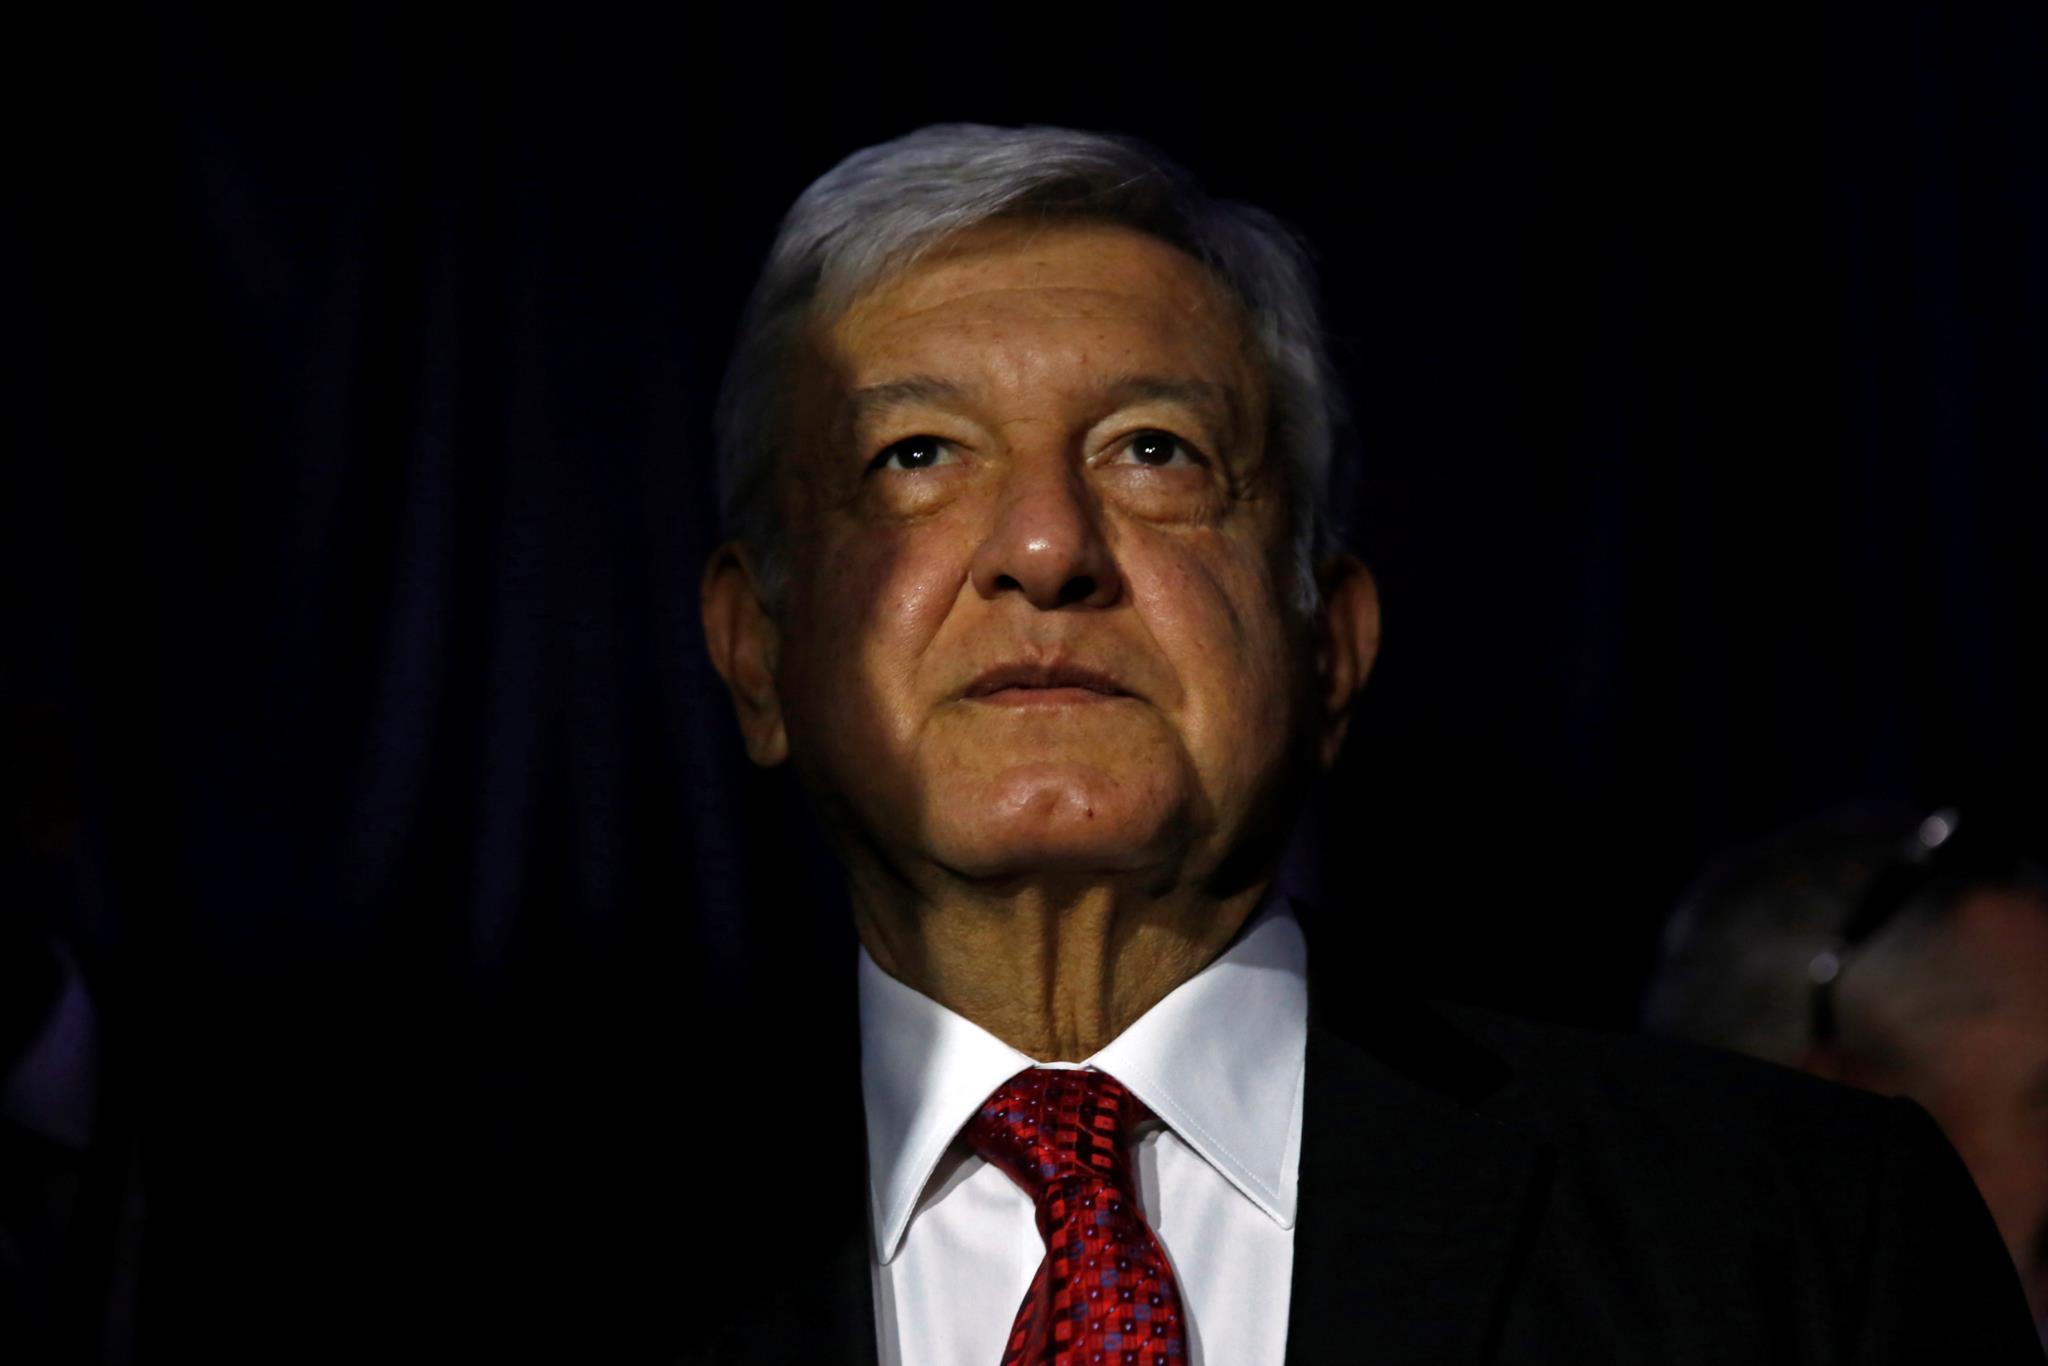 Obrador leva o México para a esquerda, contrariando a guinada à direita da América Latina